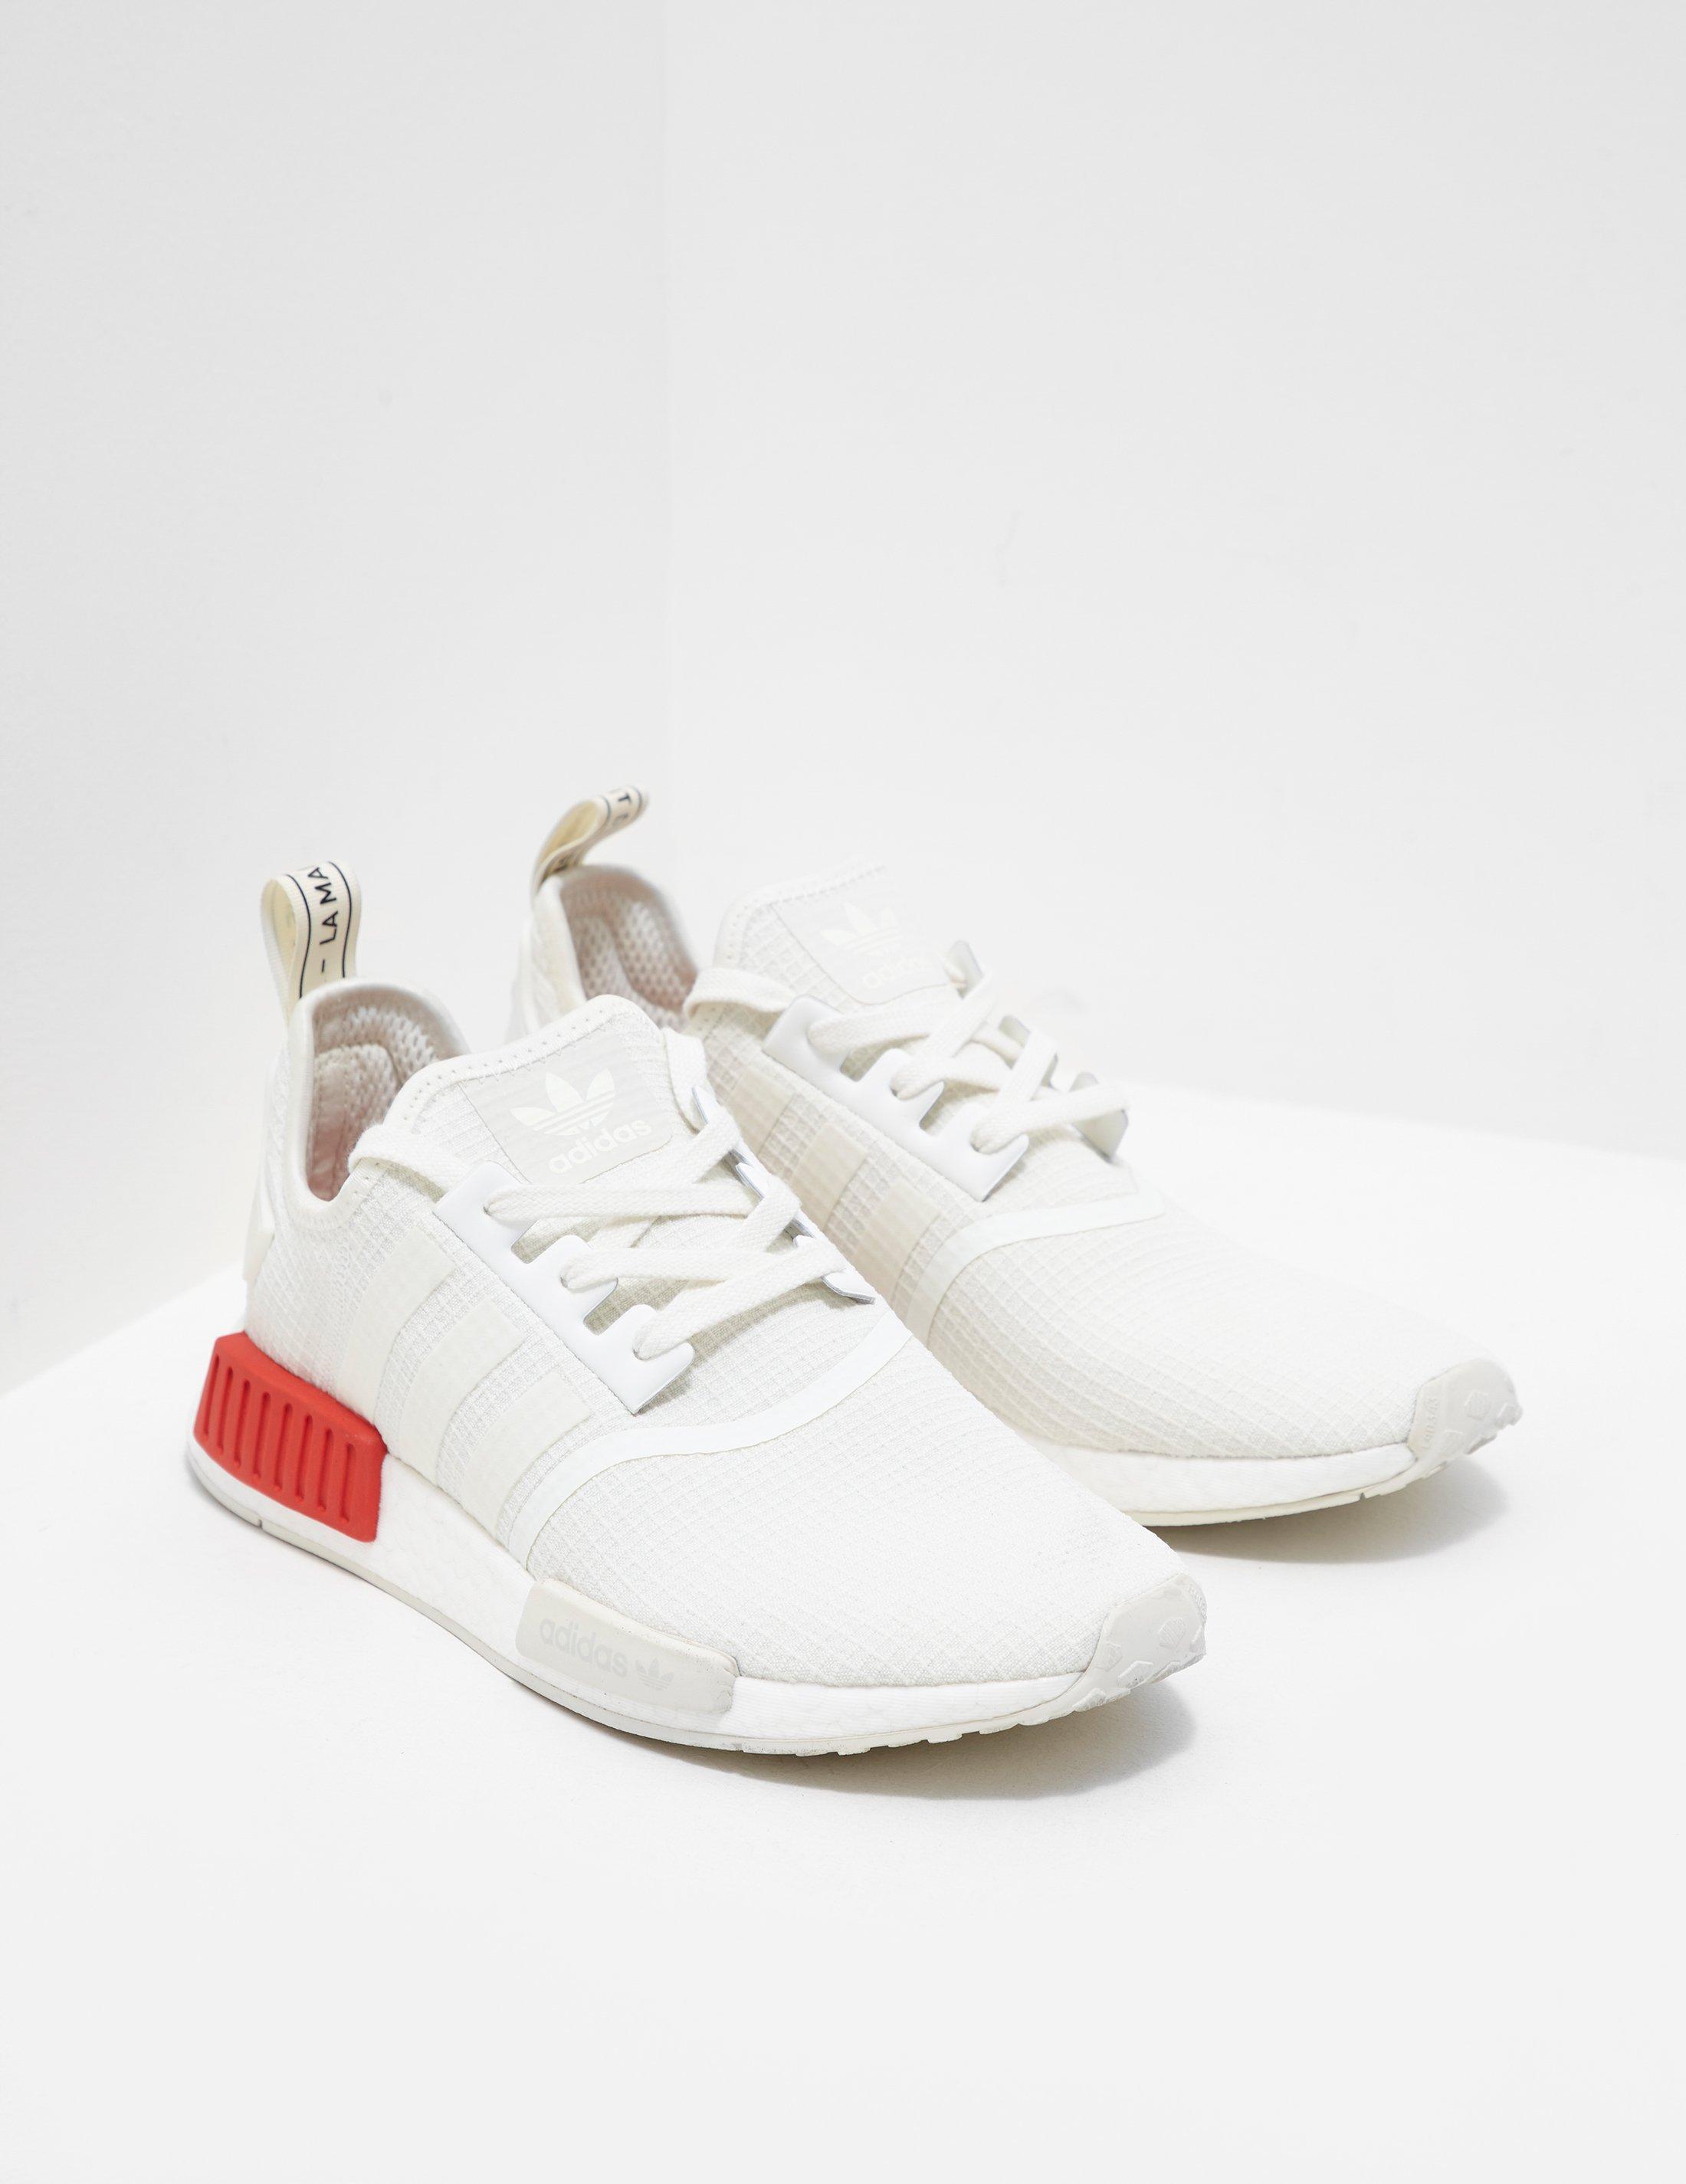 816e7dd0457 Lyst - adidas Originals Nmd R1 Ripstop White in White for Men